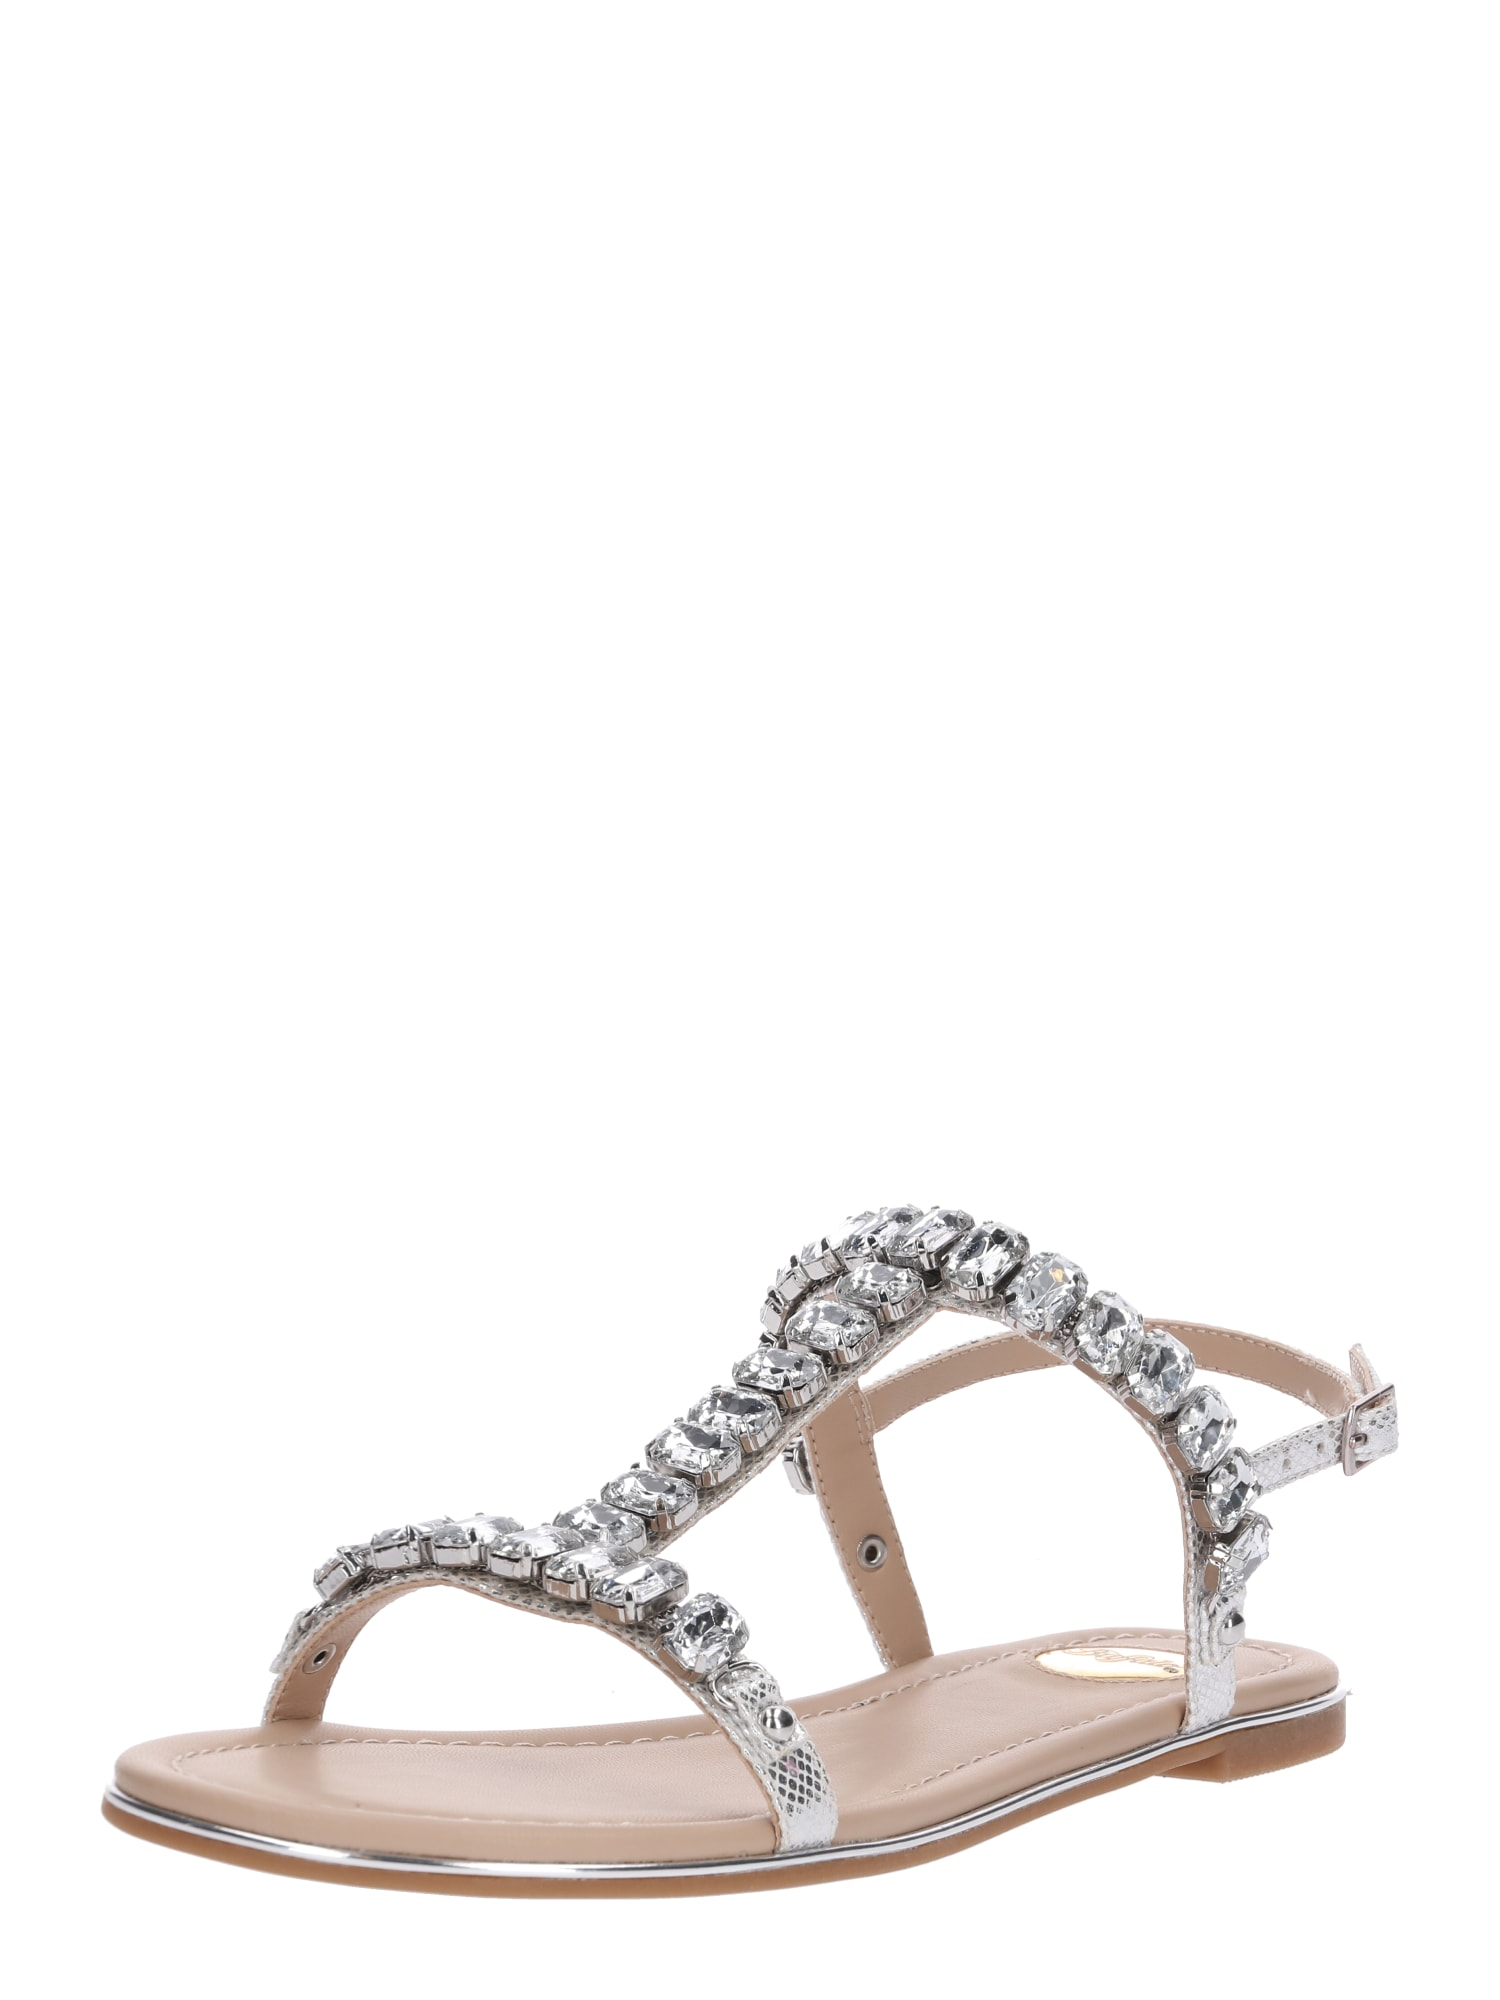 Sandály ESTELLE stříbrná BUFFALO